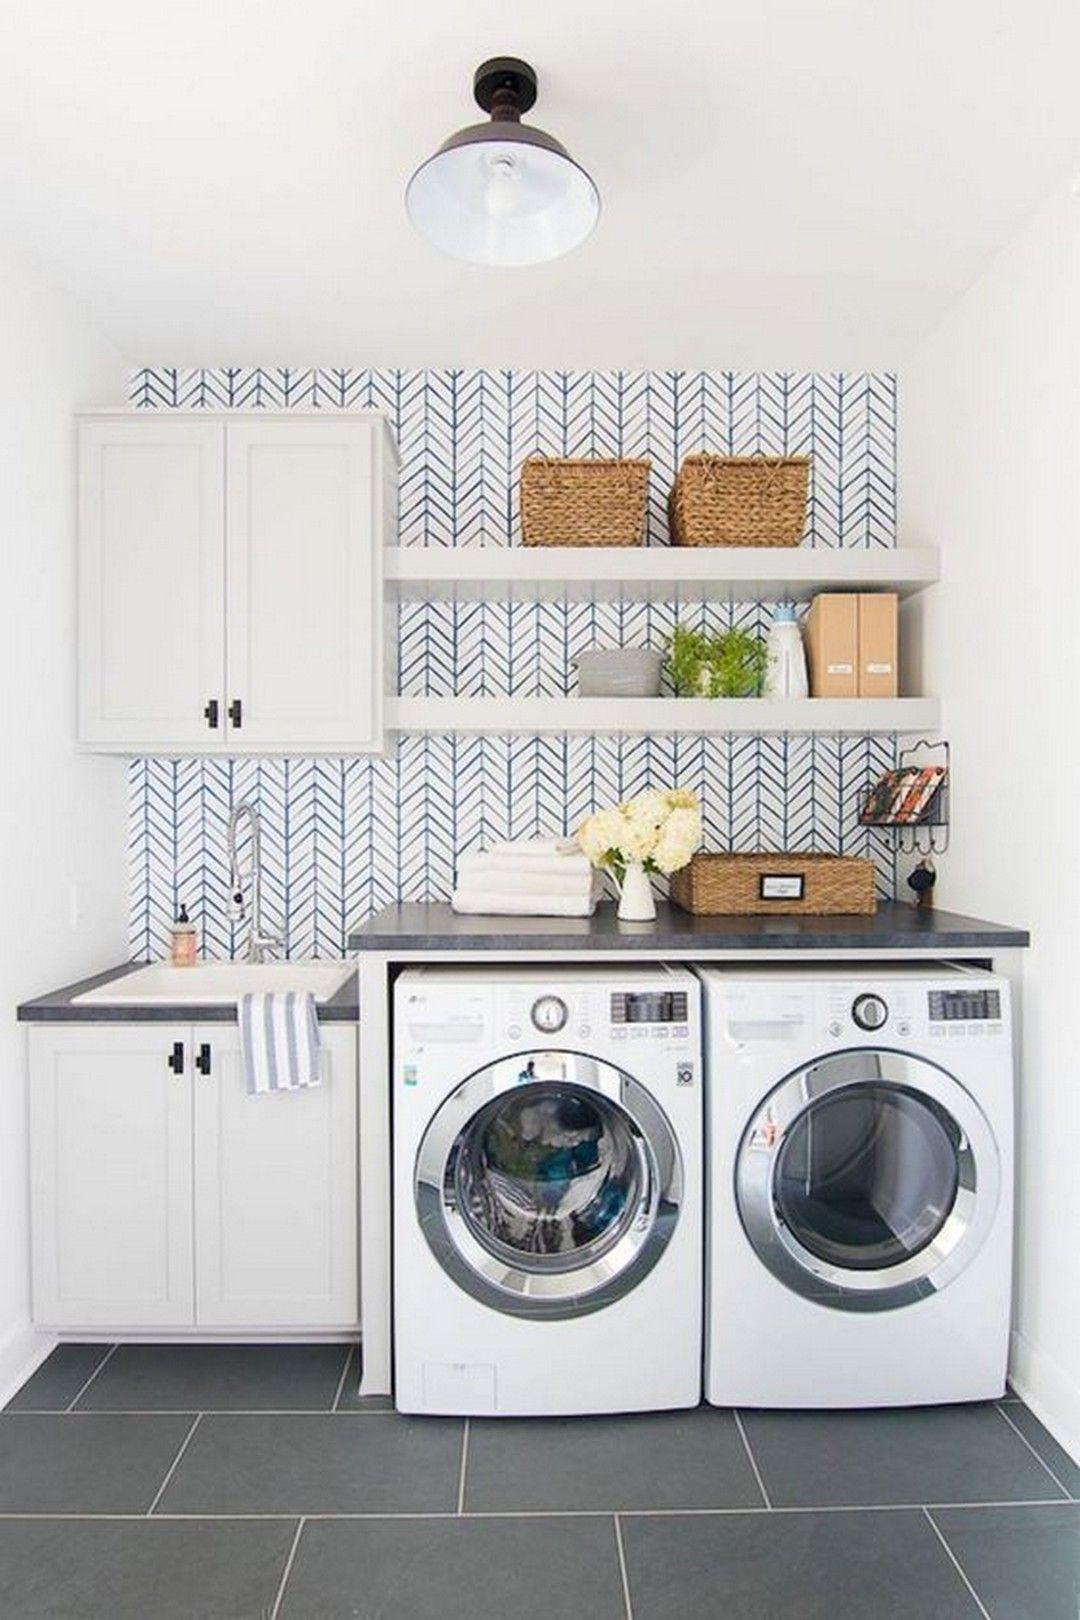 40 Amazingly Inspiring Small Laundry Room Design Ideas Laundry Room Diy Modern Laundry Rooms Diy Laundry Room Storage